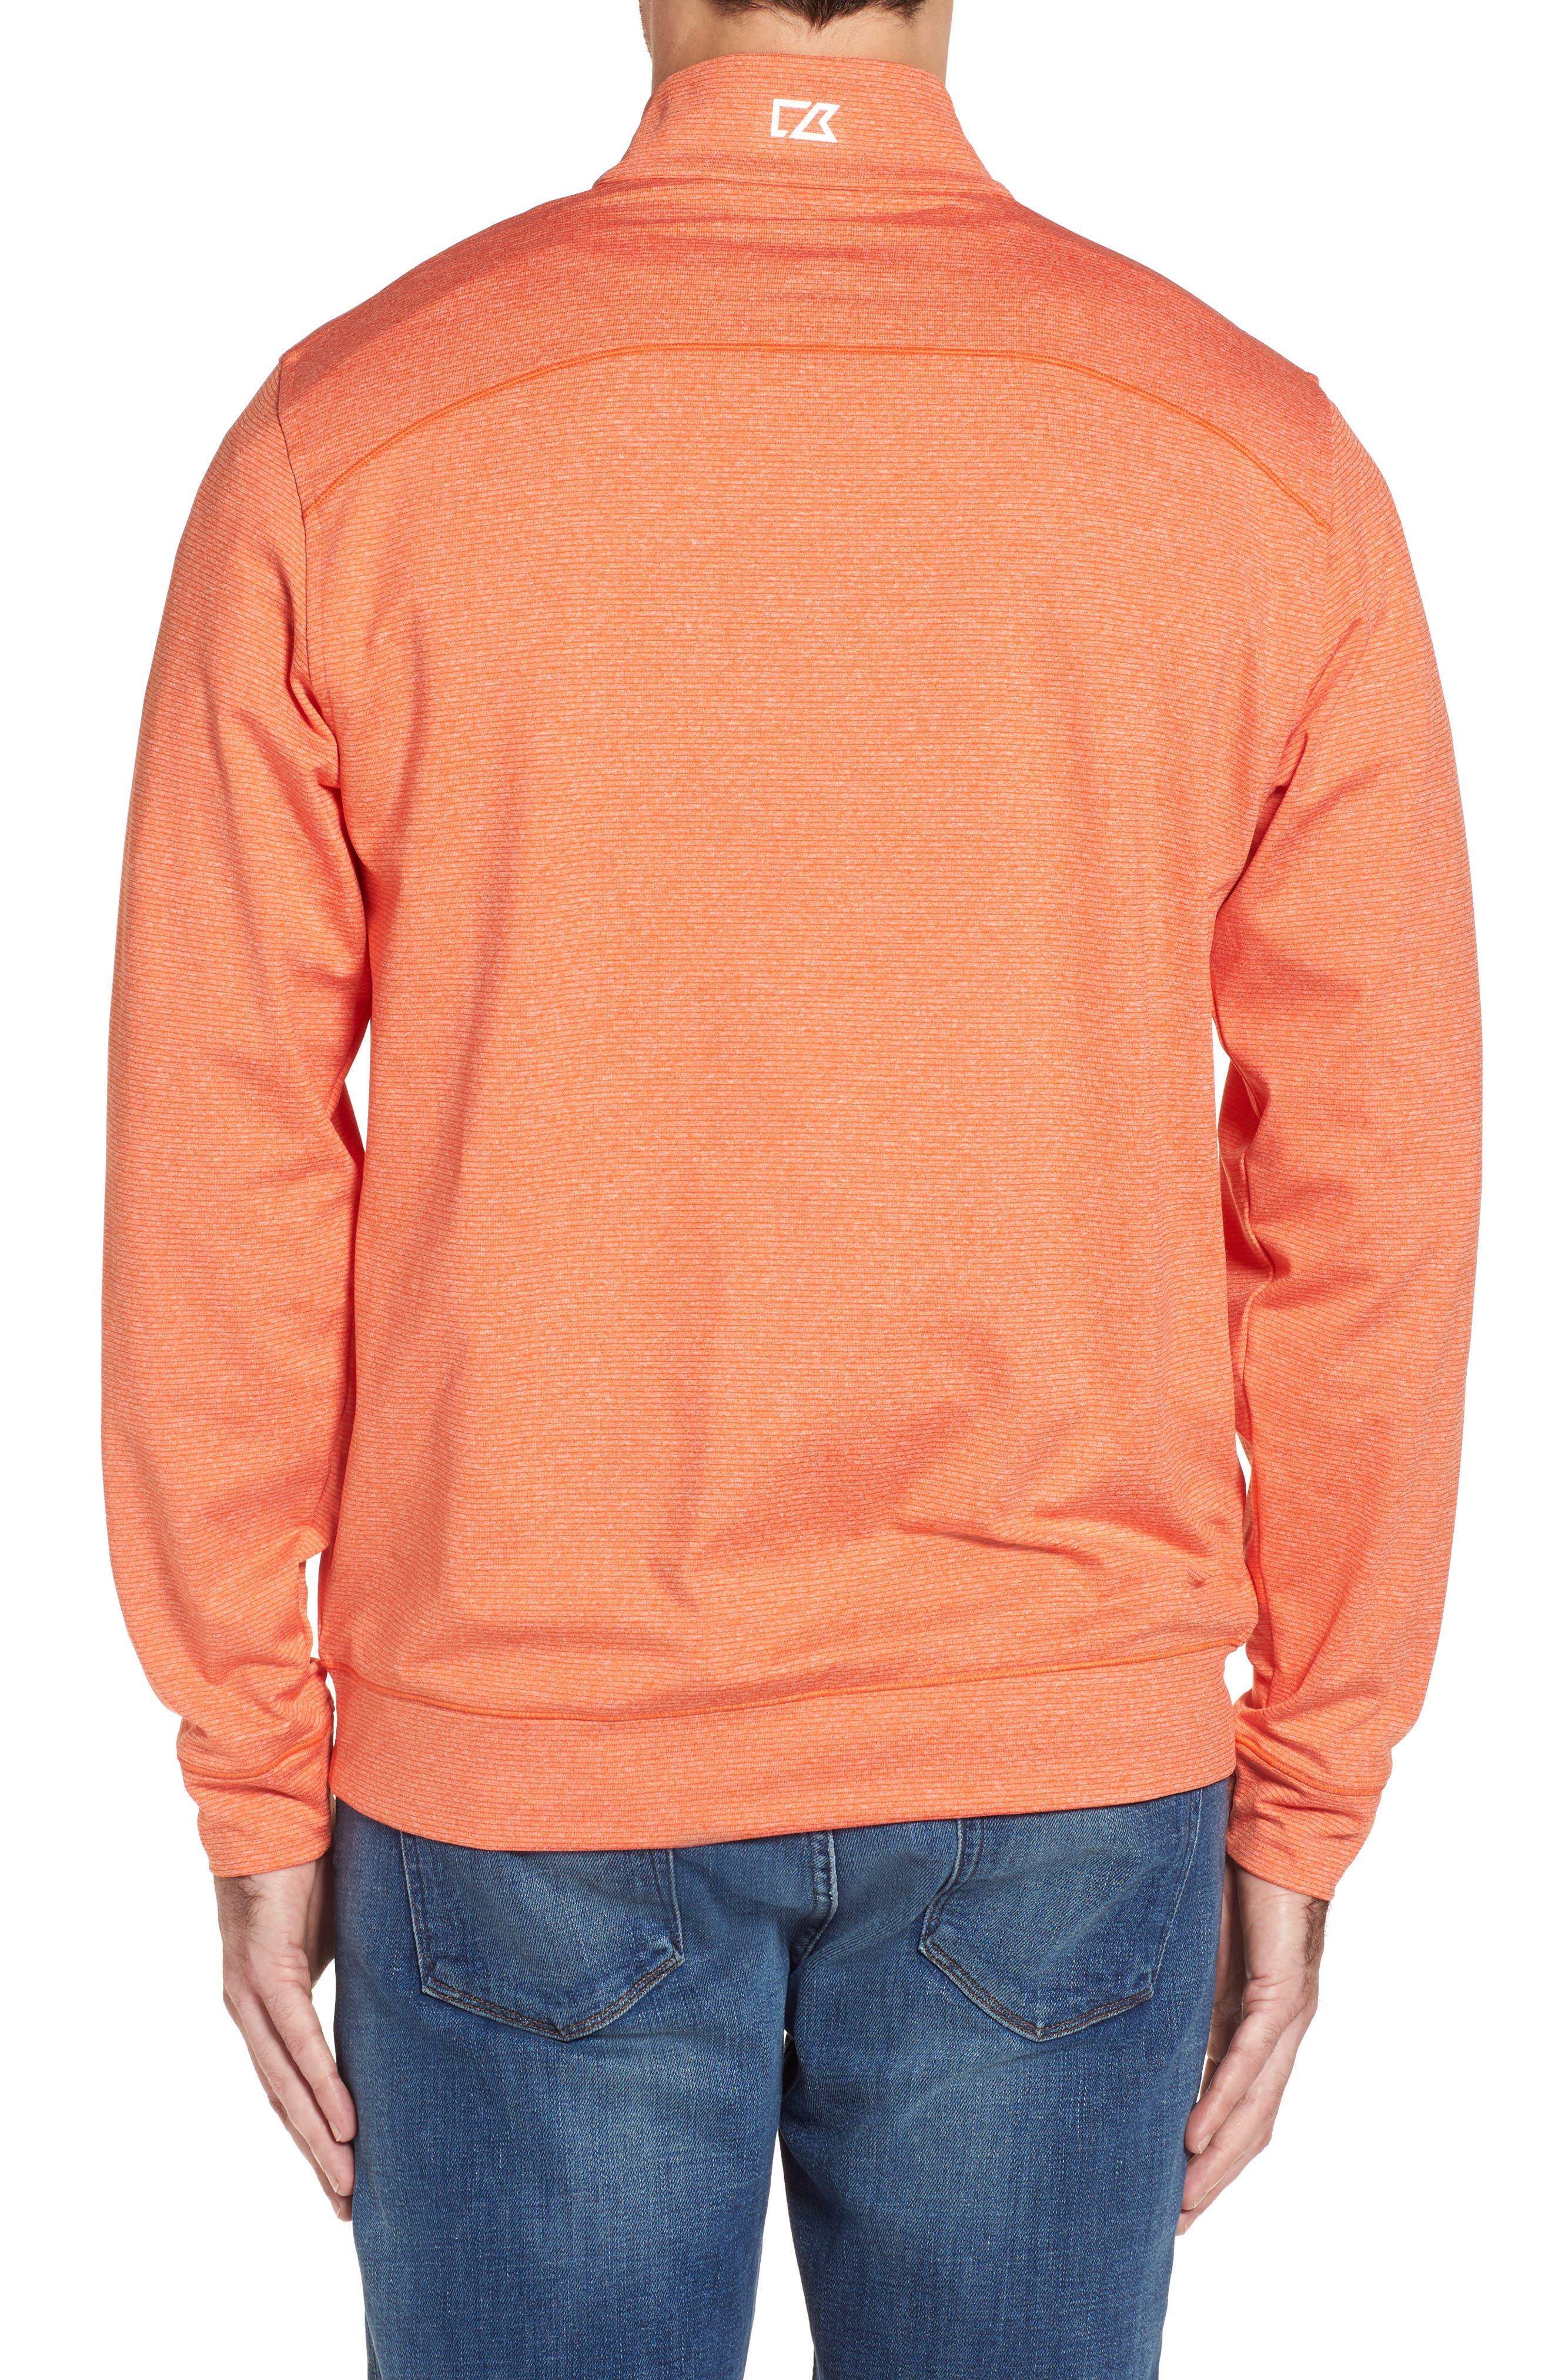 Shoreline - Denver Broncos Half Zip Pullover,                             Alternate thumbnail 2, color,                             College Orange Heather